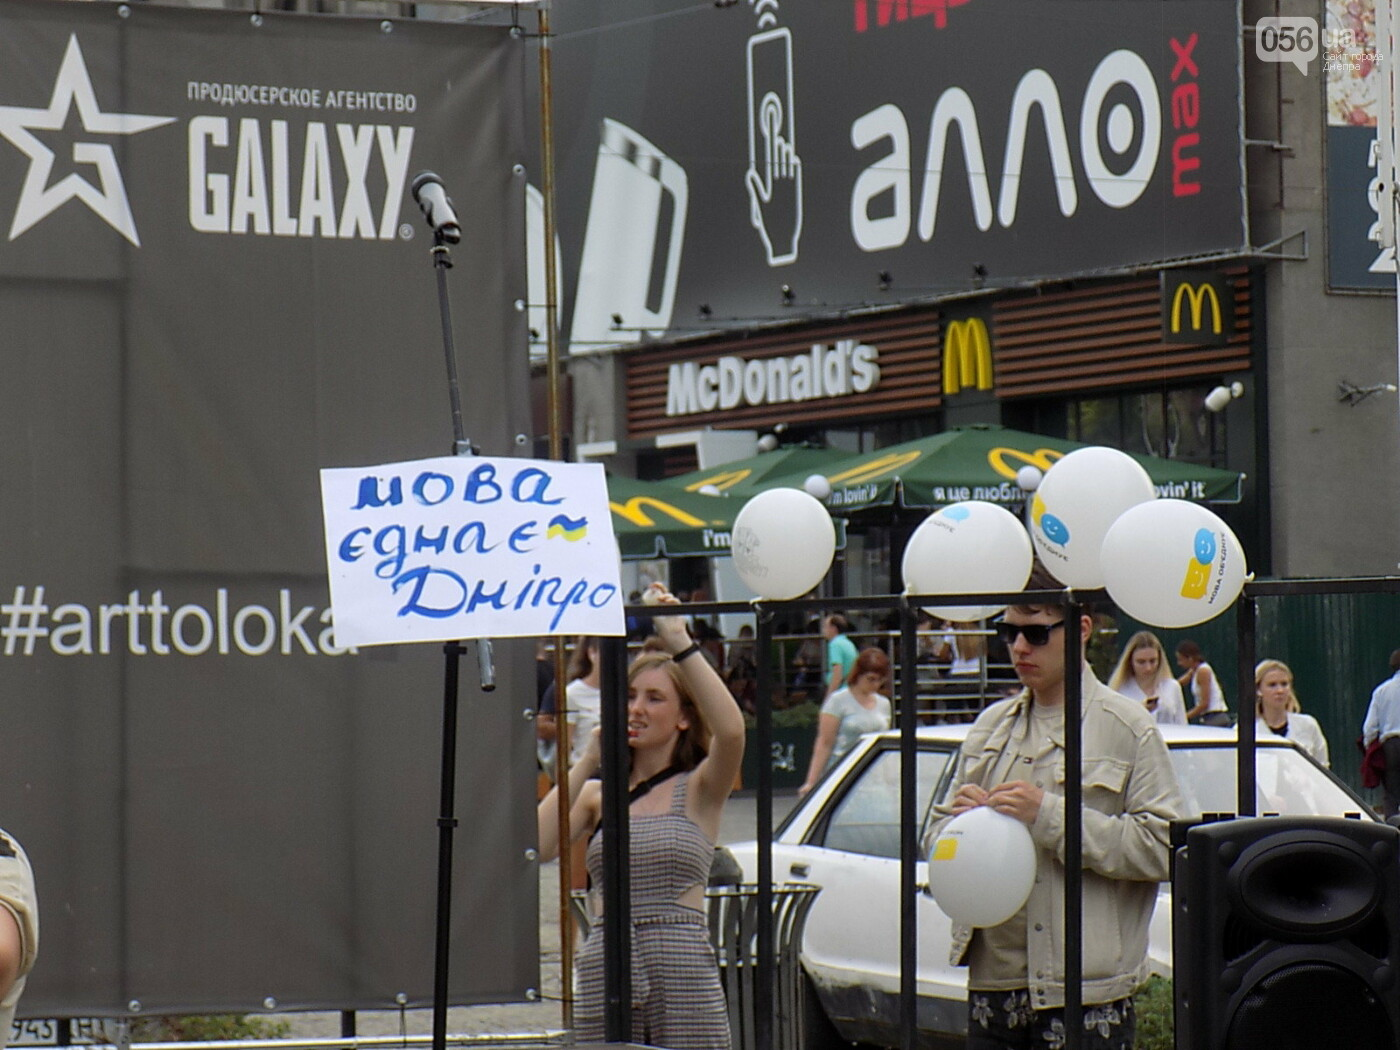 """Мова єднає Дніпро"": в центре города прошла символическая акция с концертом и подарками, - ФОТО, фото-1"